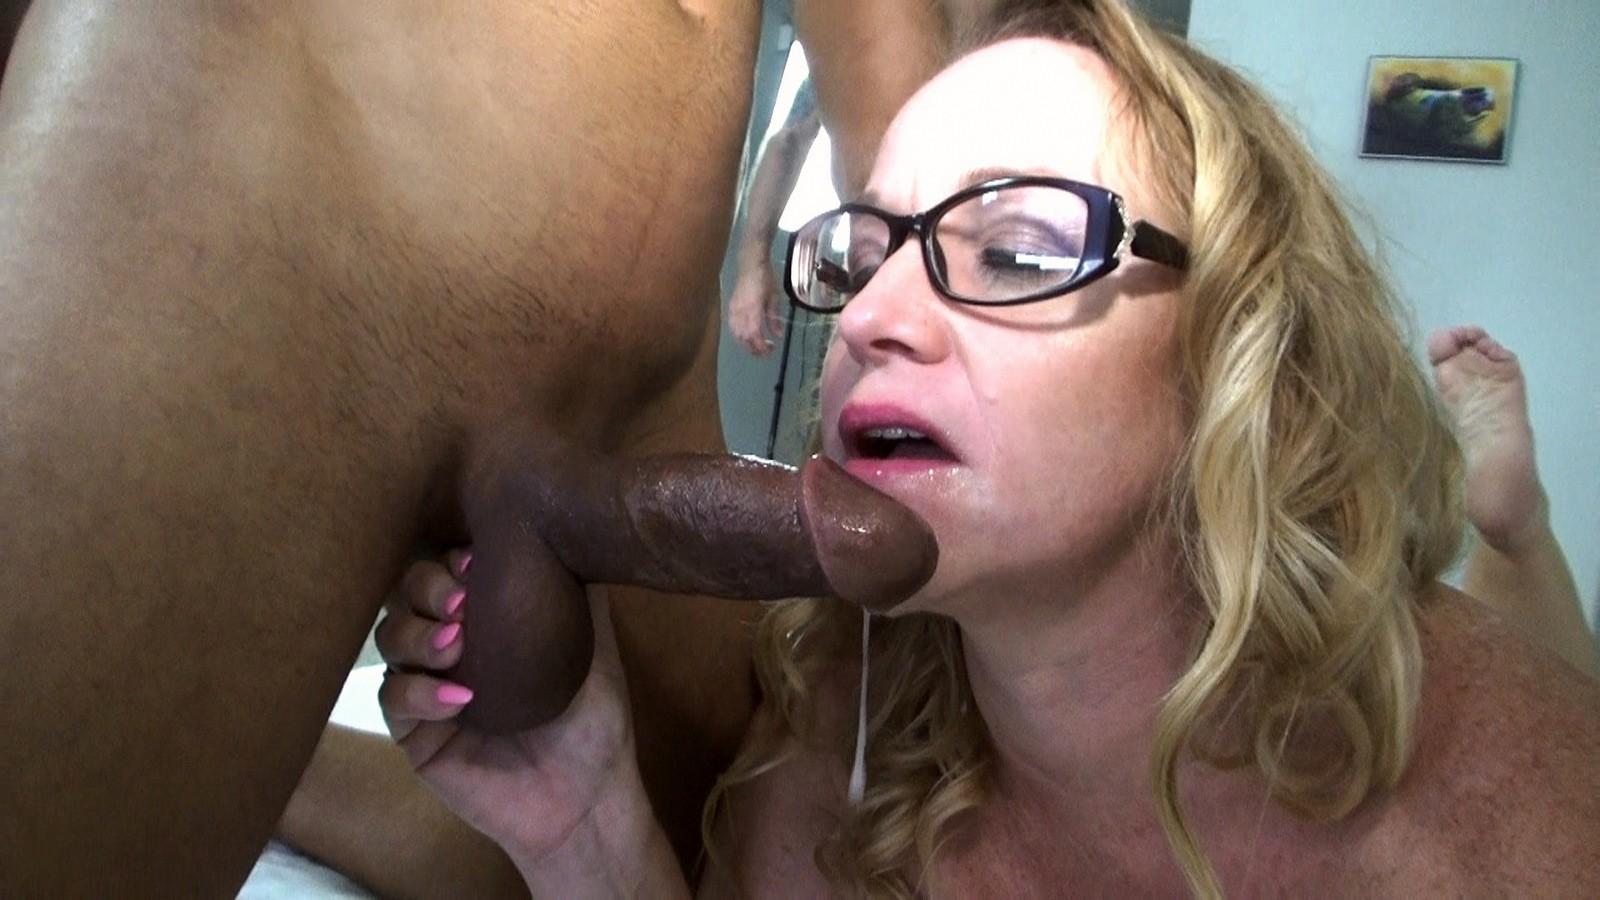 Cuckold lick pussy